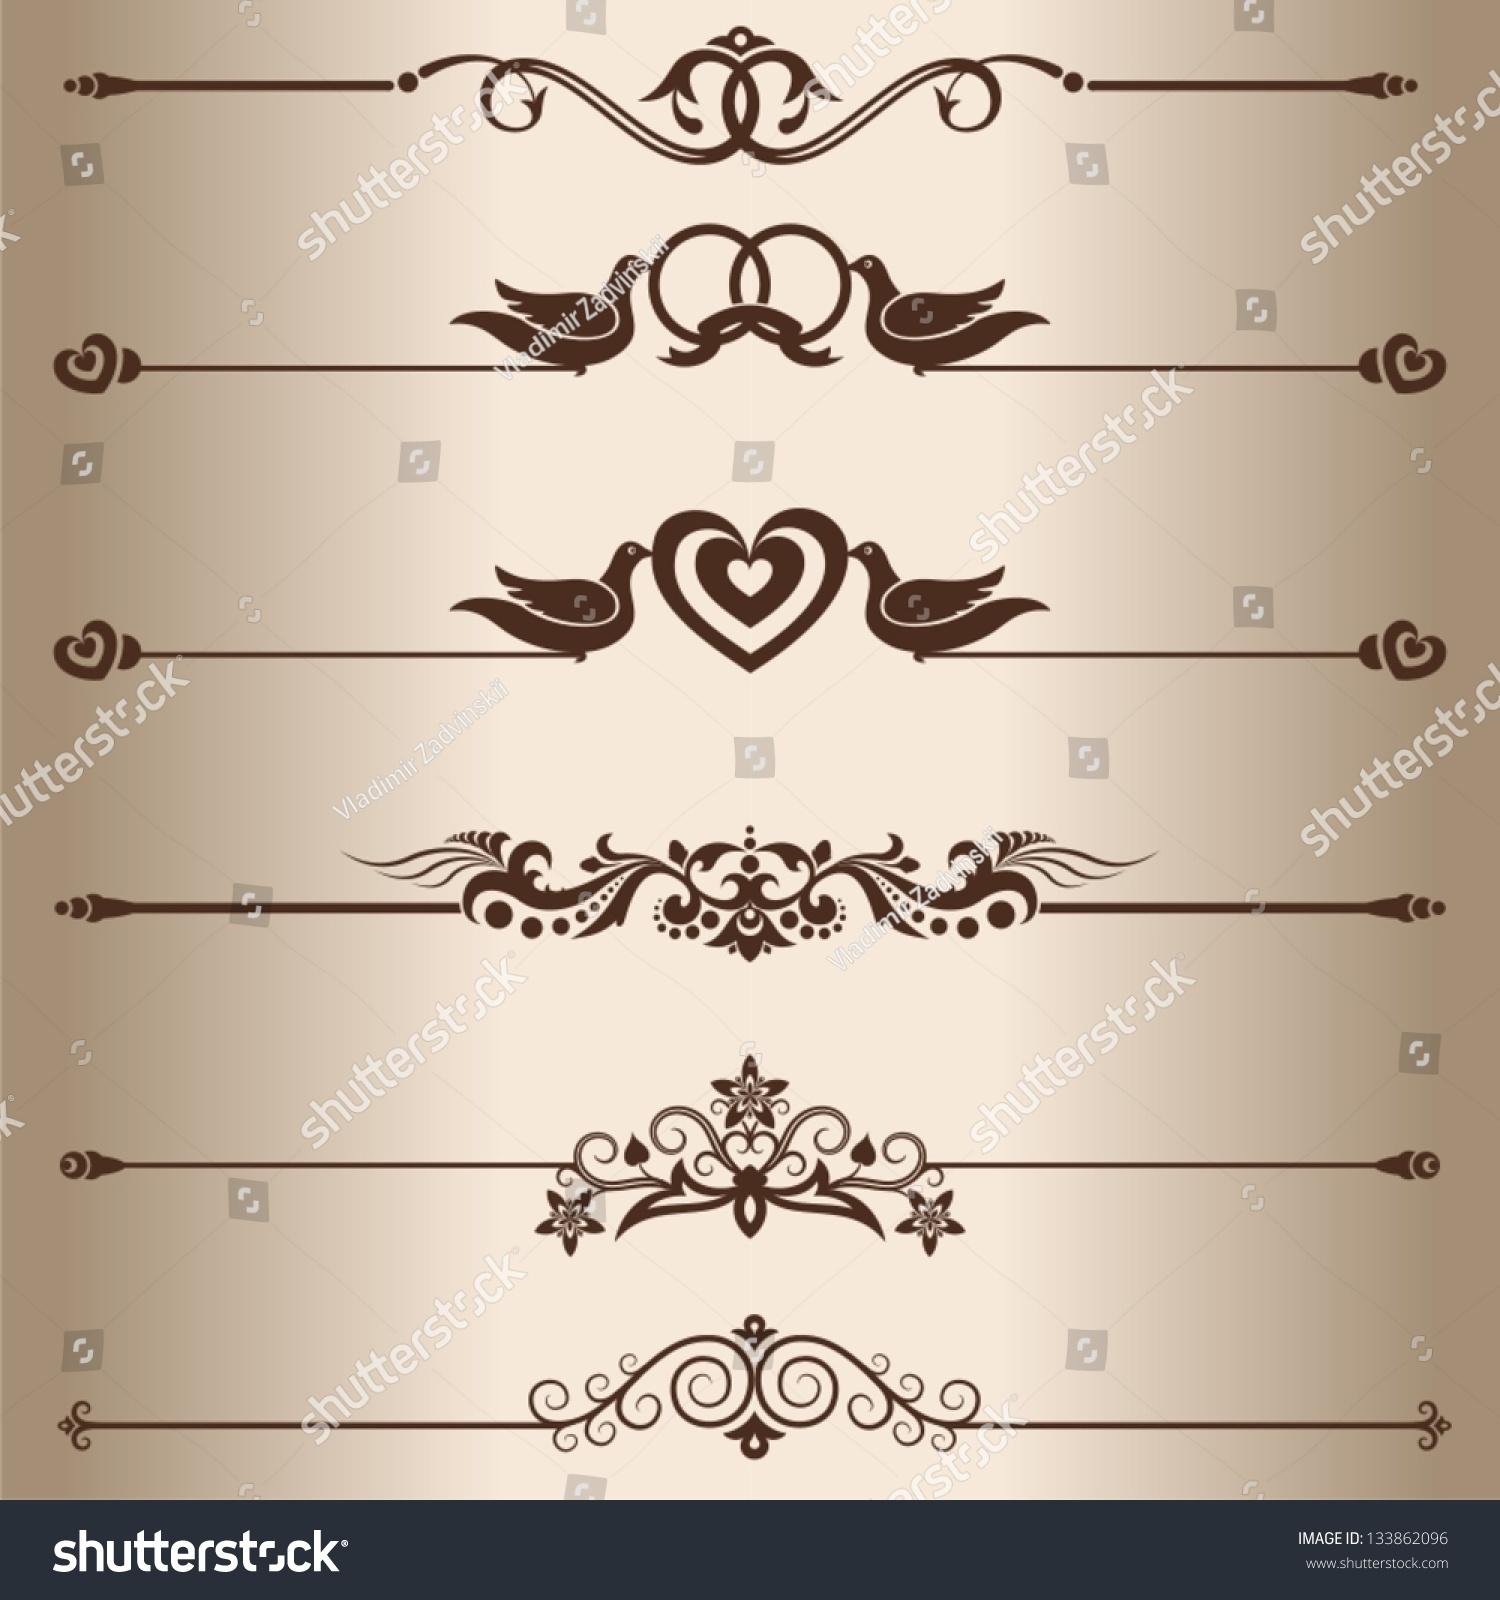 decorative lines elements design decorative line stock